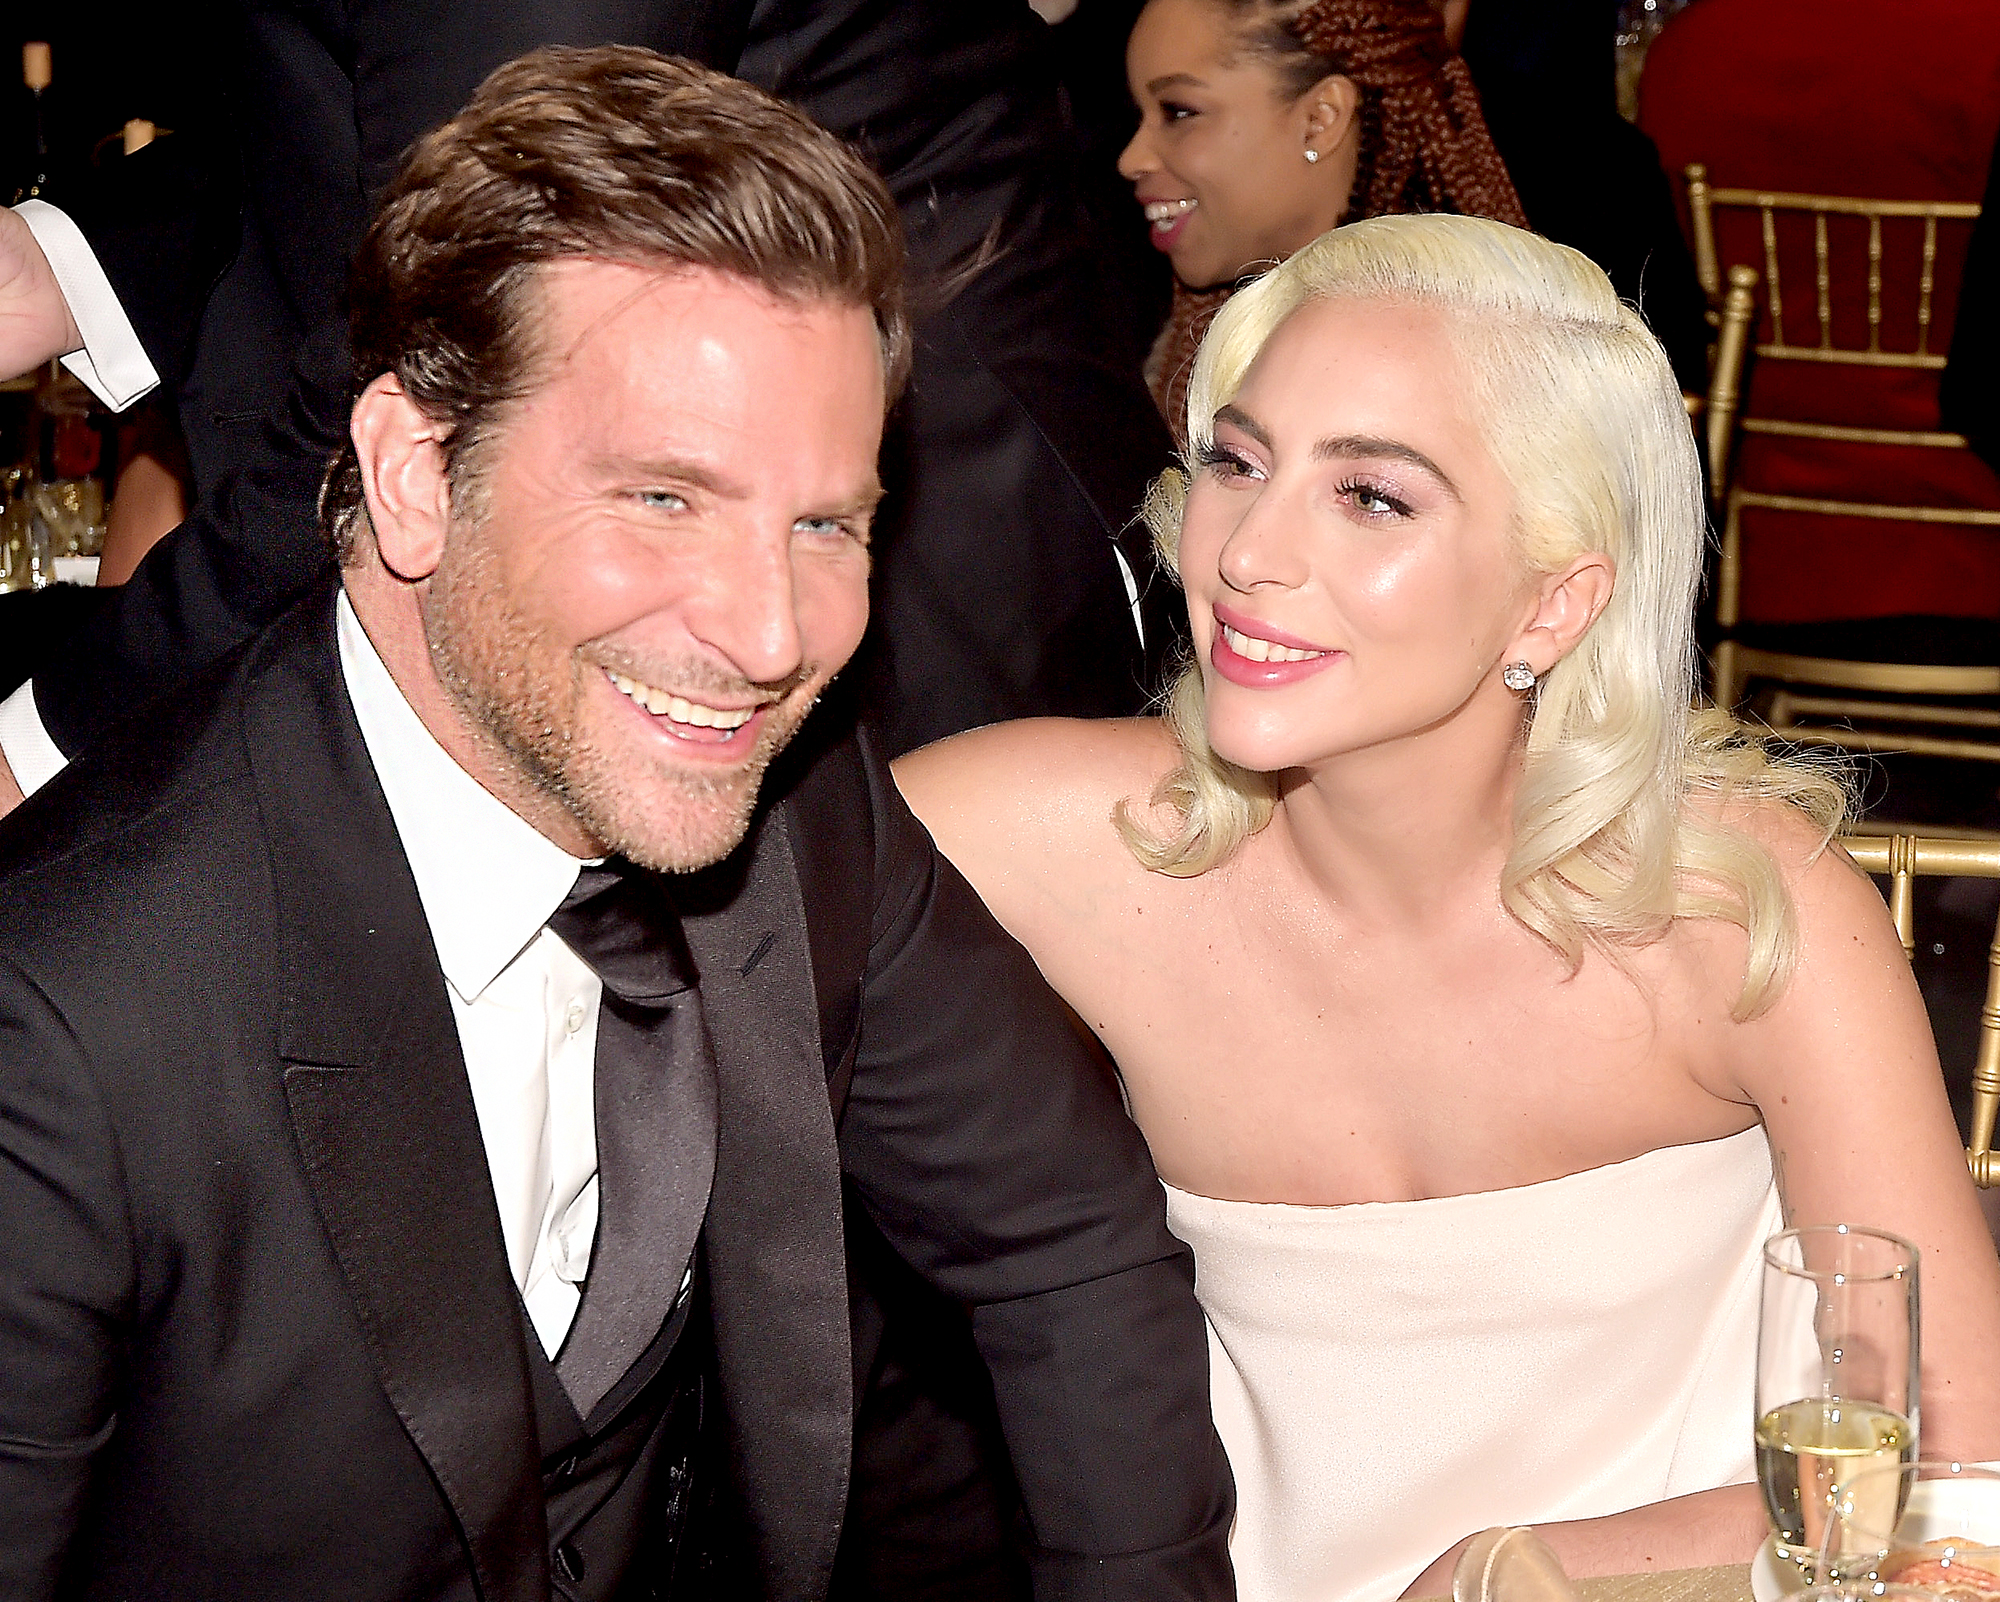 Bradley-Cooper-Lady-Gaga-Romance-Rumors